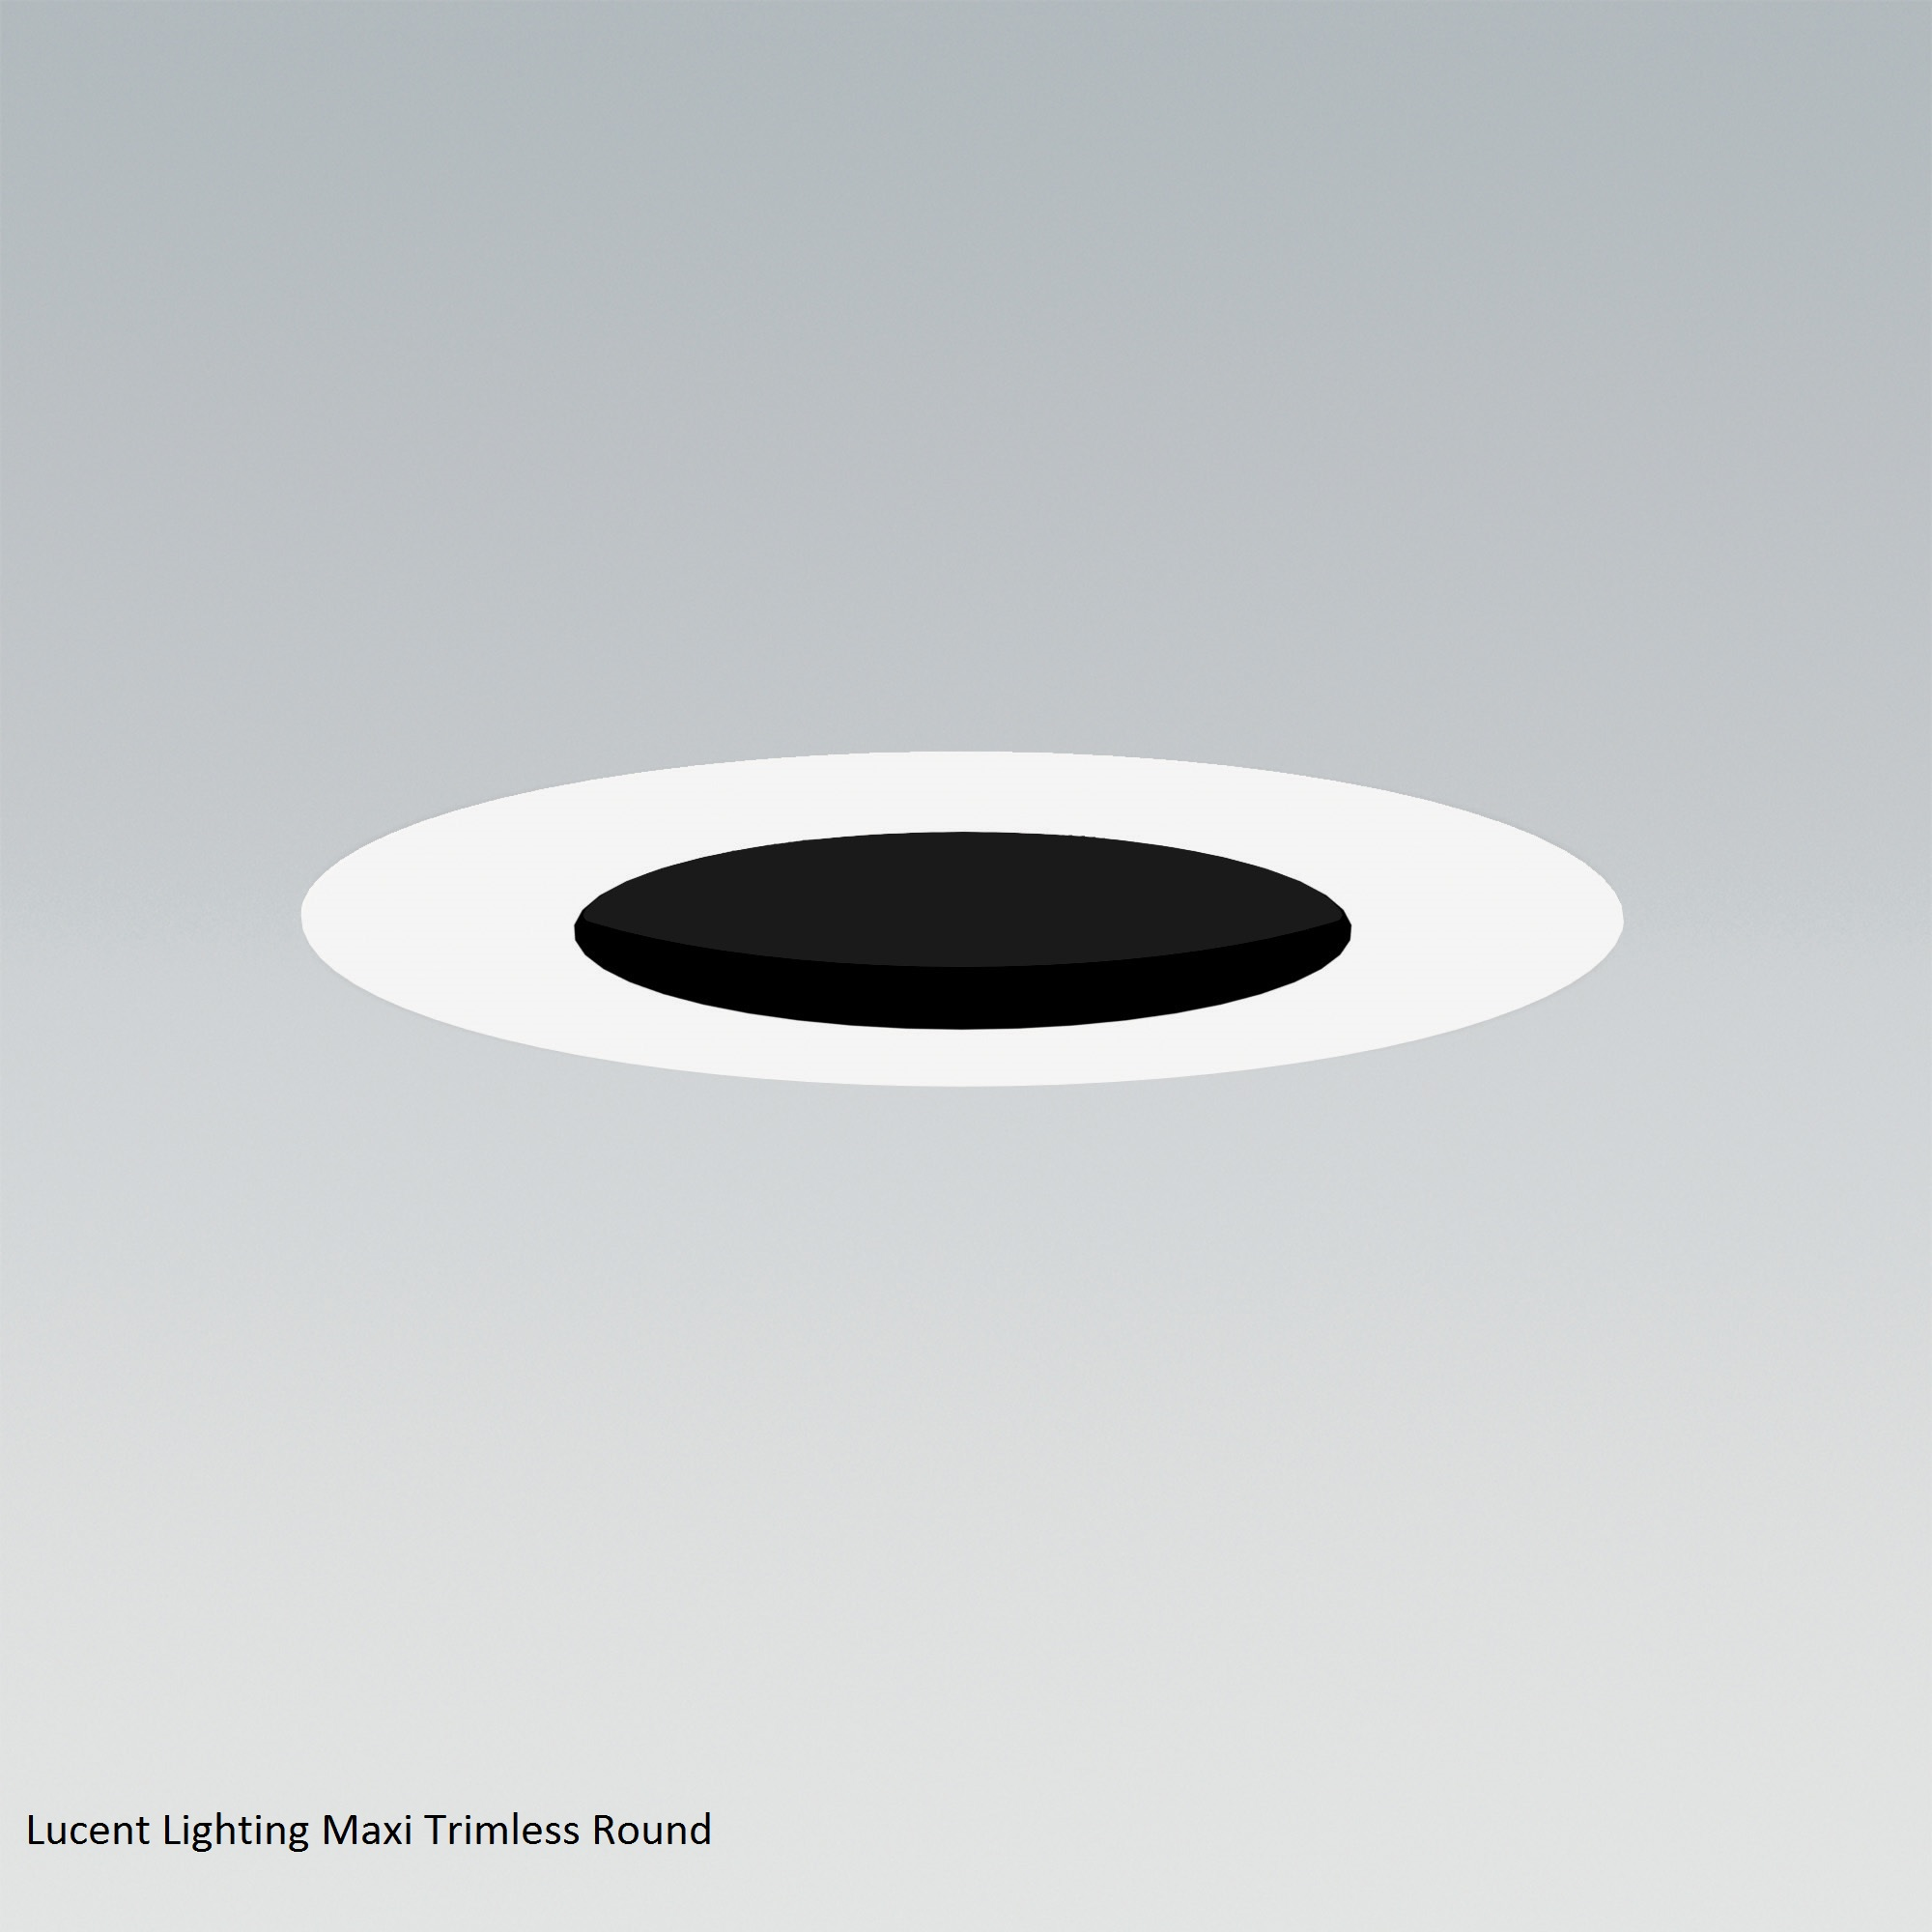 lucent-lighting-maxi-trimless-round